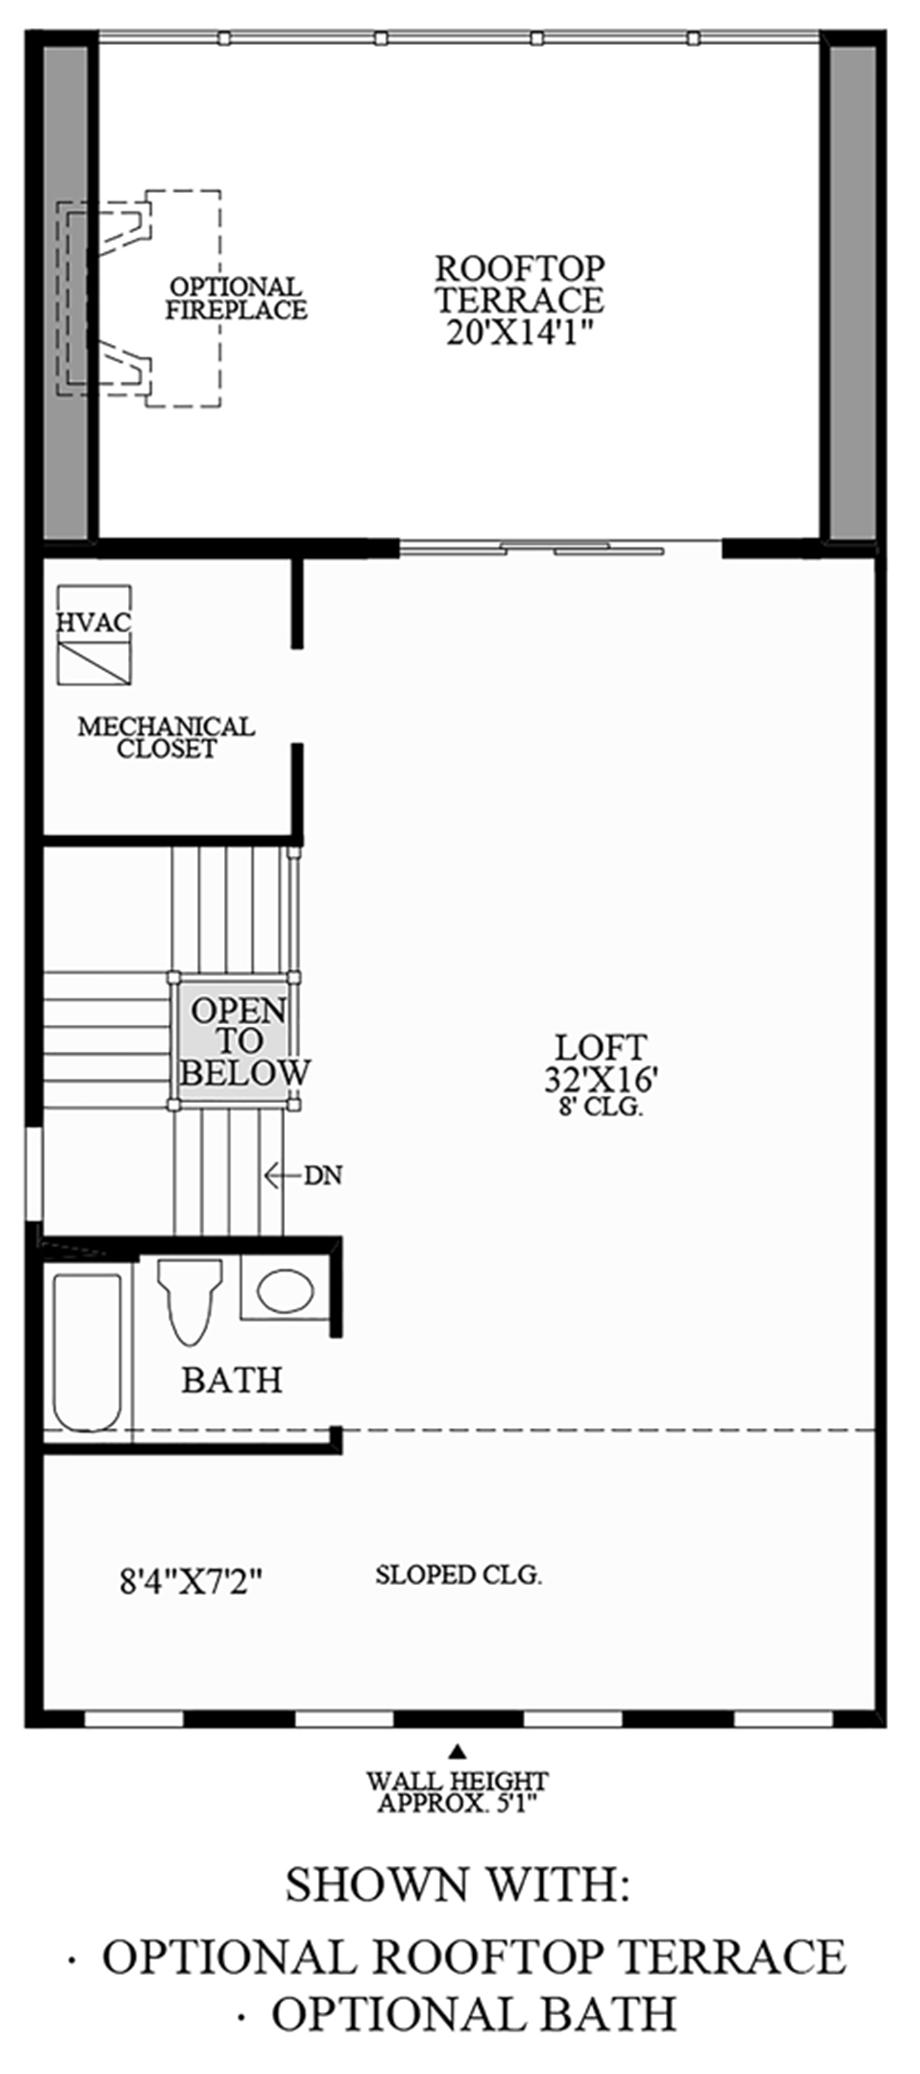 Optional Rooftop Terrace and Optional Bath Floor Plan